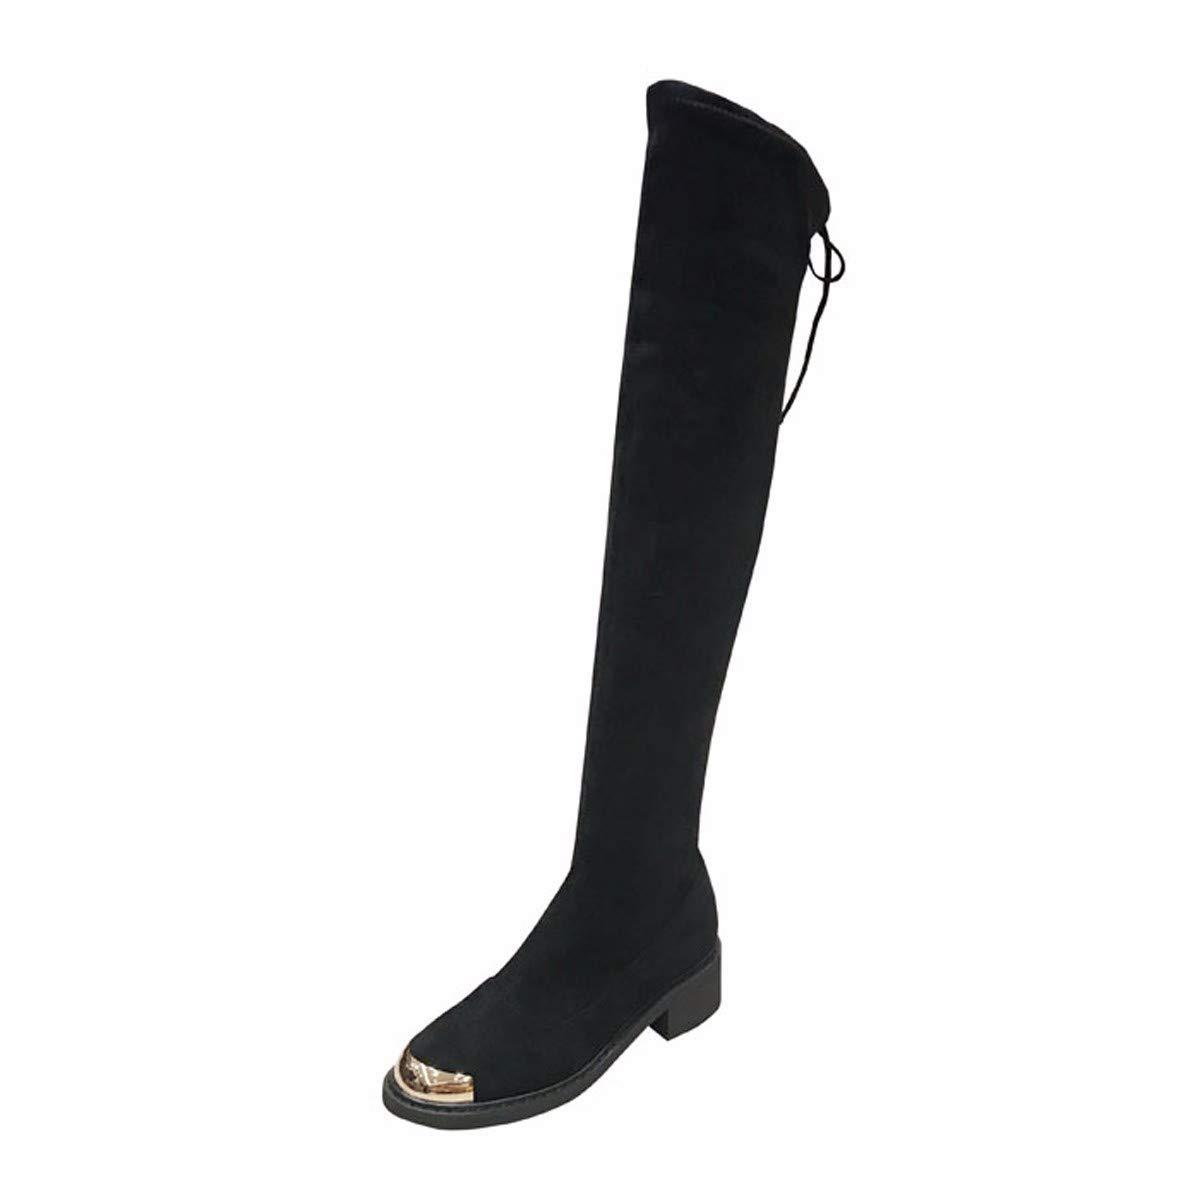 HBDLH Damenschuhe Elastizität Dünn Stiefel Heel Flachen 4Cm Dicke Schuhe Knielangen Stiefeln Flachen Heel Boden Stiefel 569e79